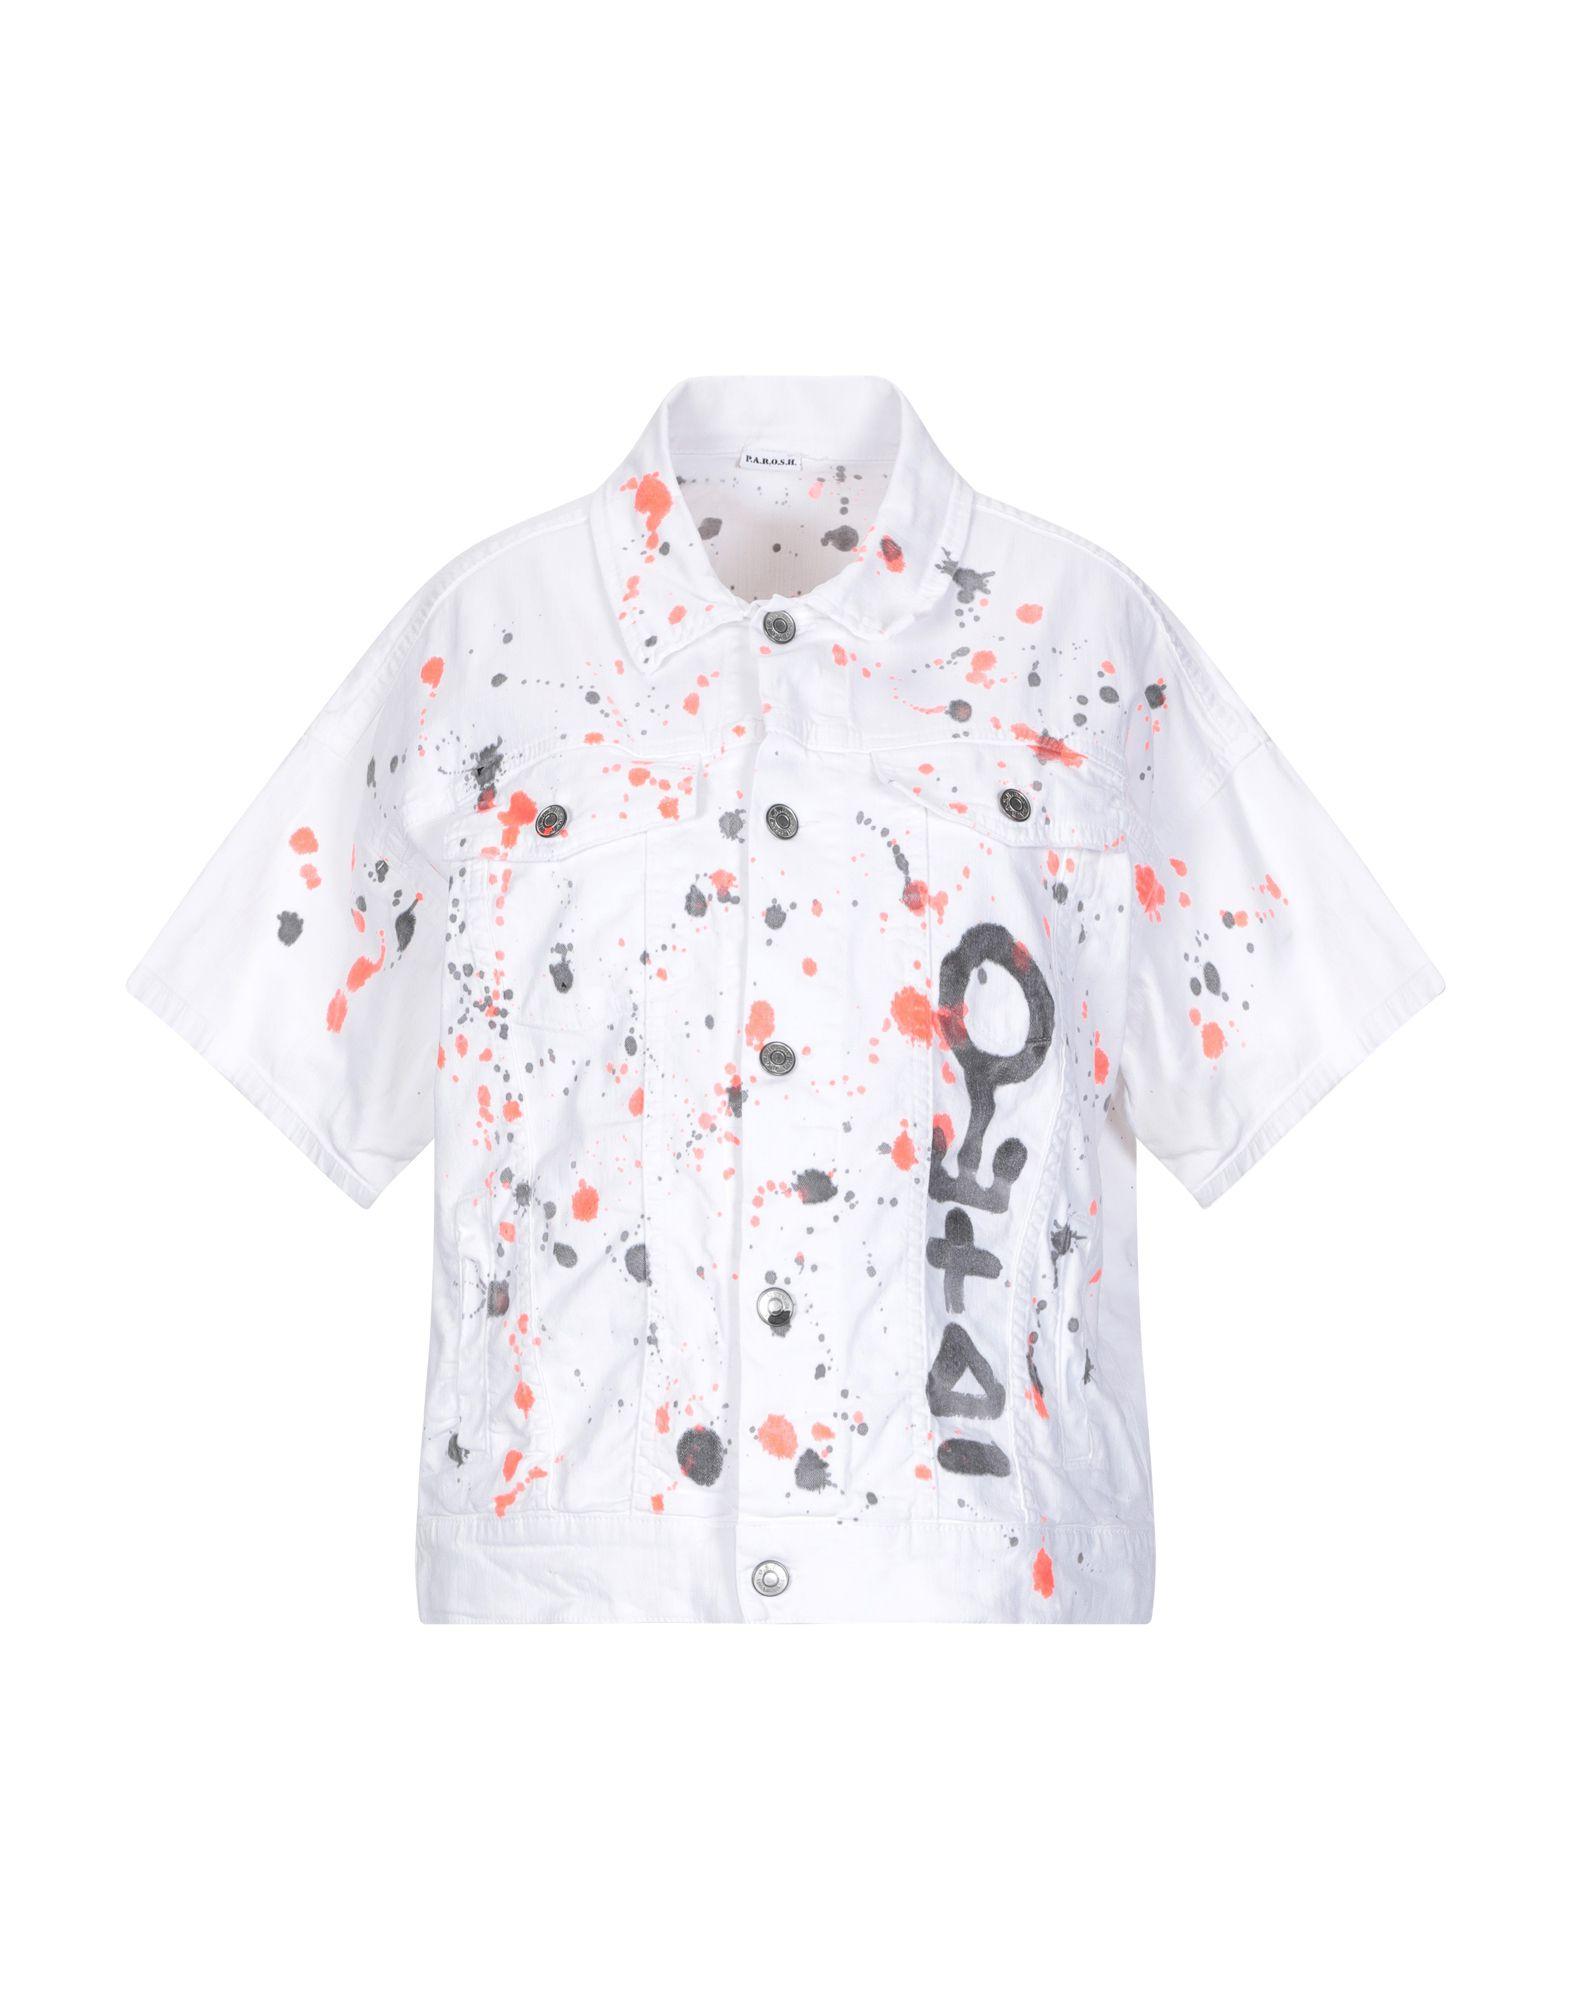 цена на P.A.R.O.S.H. Джинсовая верхняя одежда